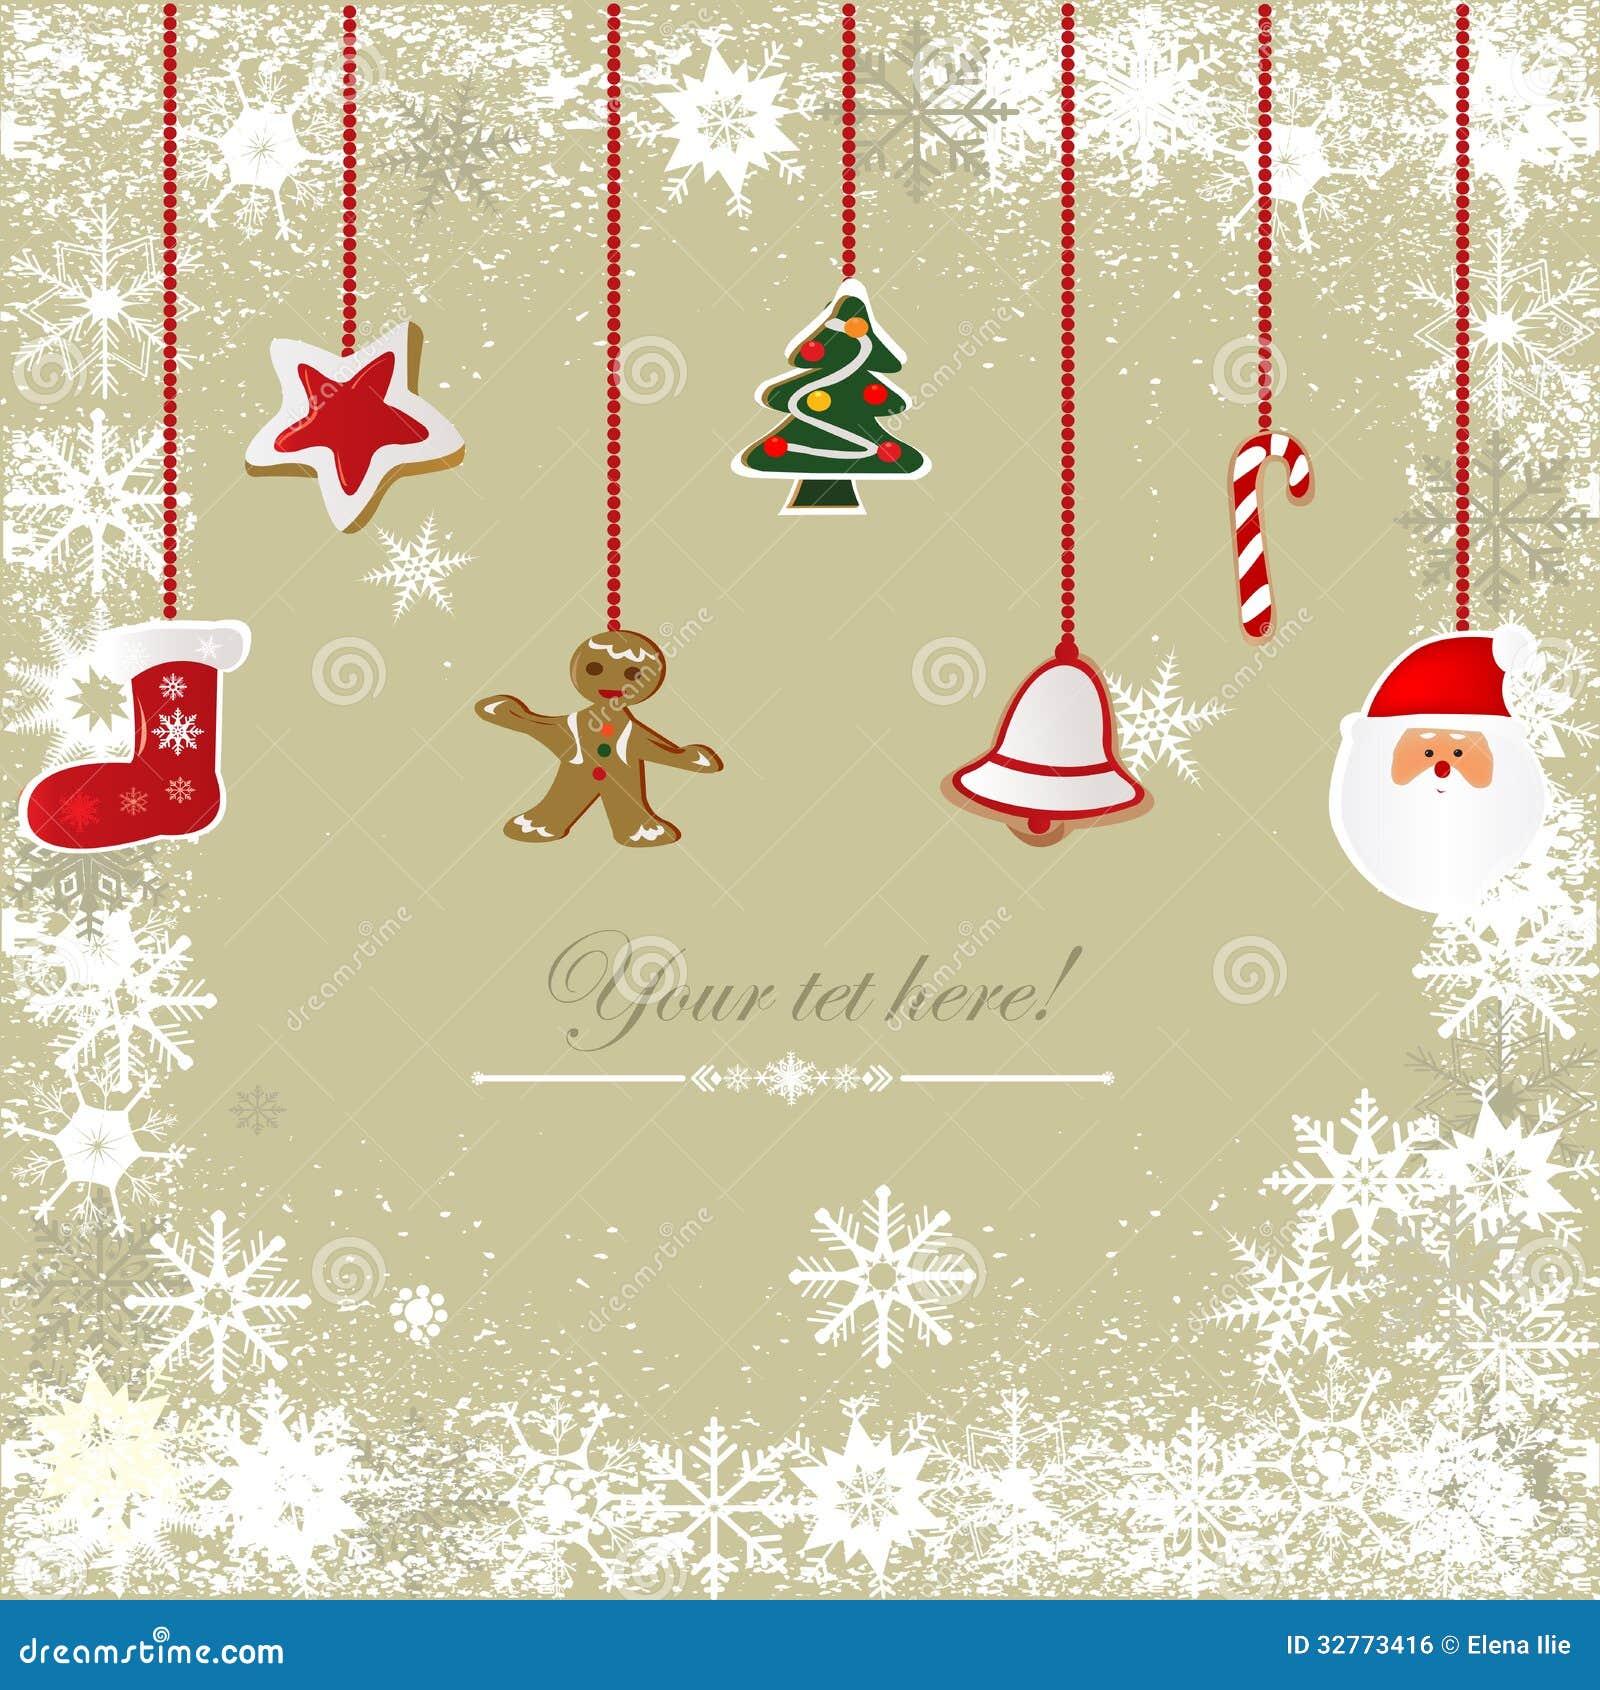 Printable Snowflake Invitations were Great Layout To Create Fresh Invitations Sample